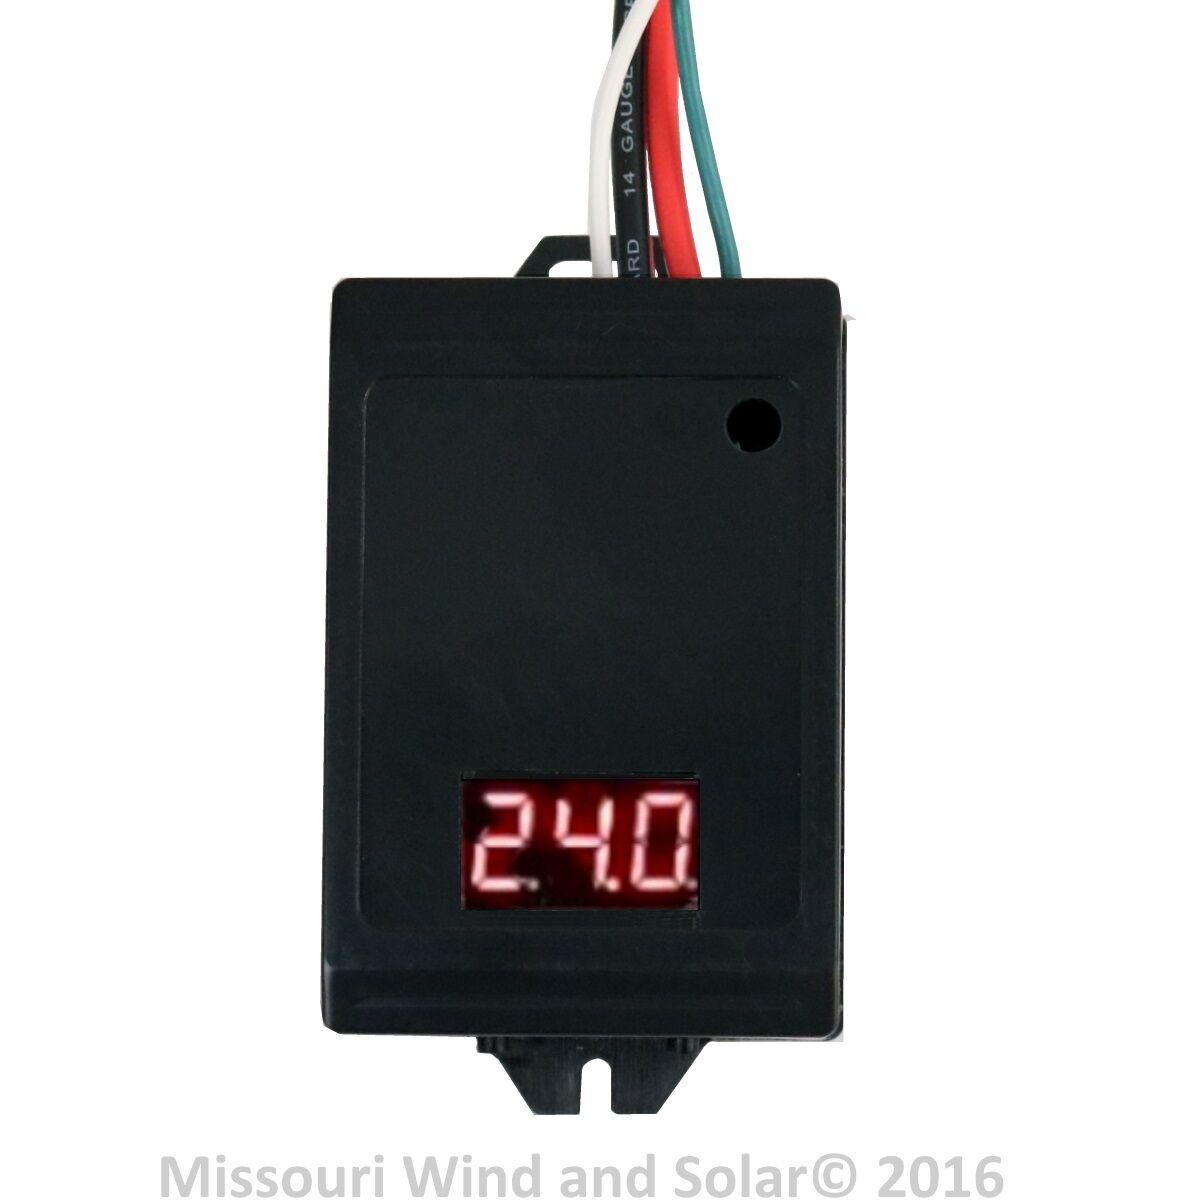 10000 Watt 440 Amp Hybrid Charge Controller 24 Volt For Wind Turbine Dumpload Missouri And Solar Panel